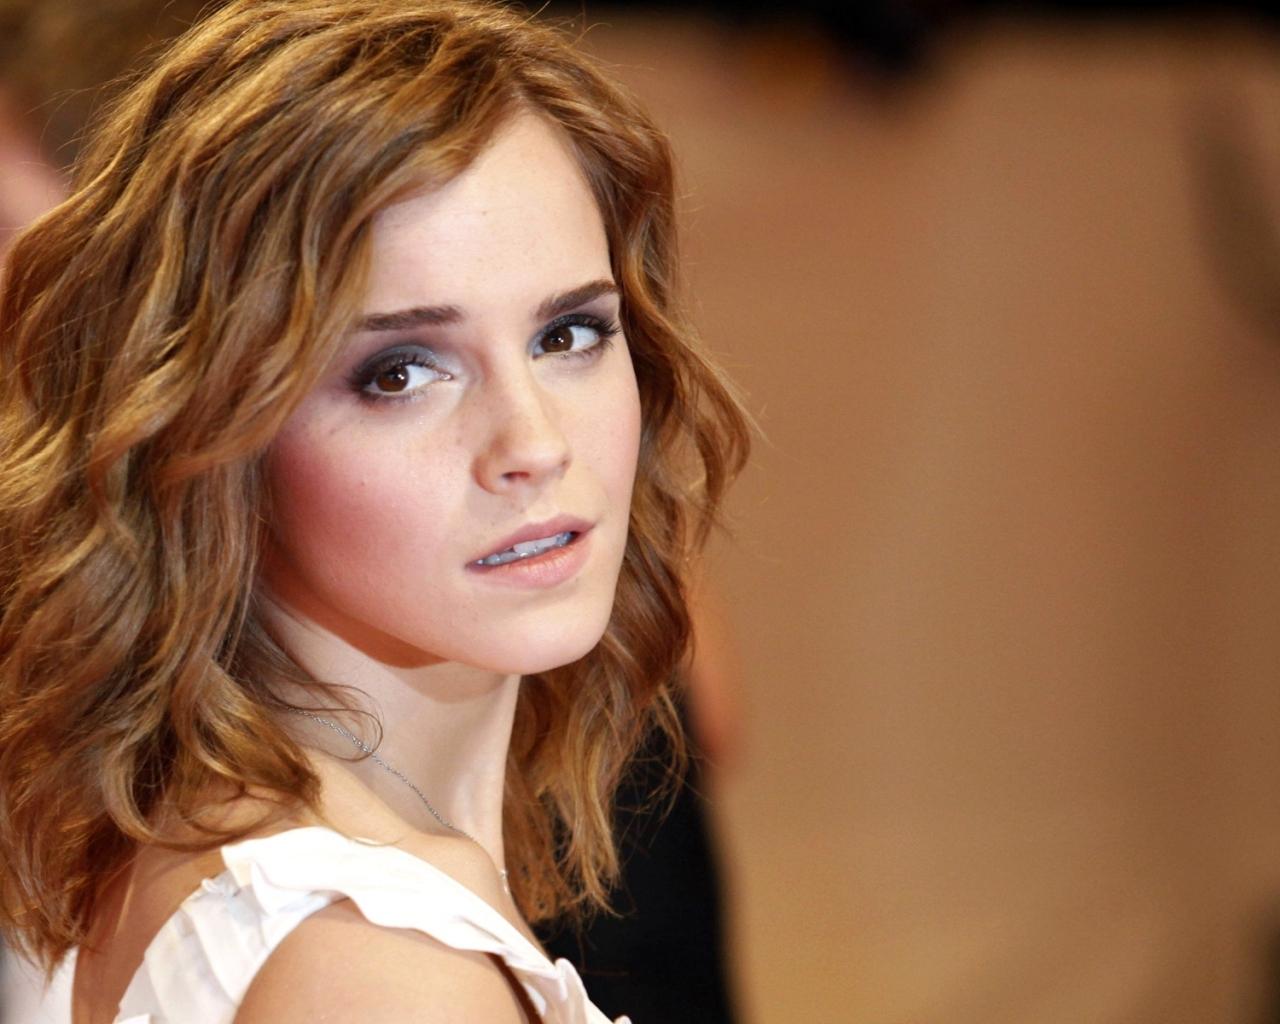 La bella Emma Watson - 1280x1024